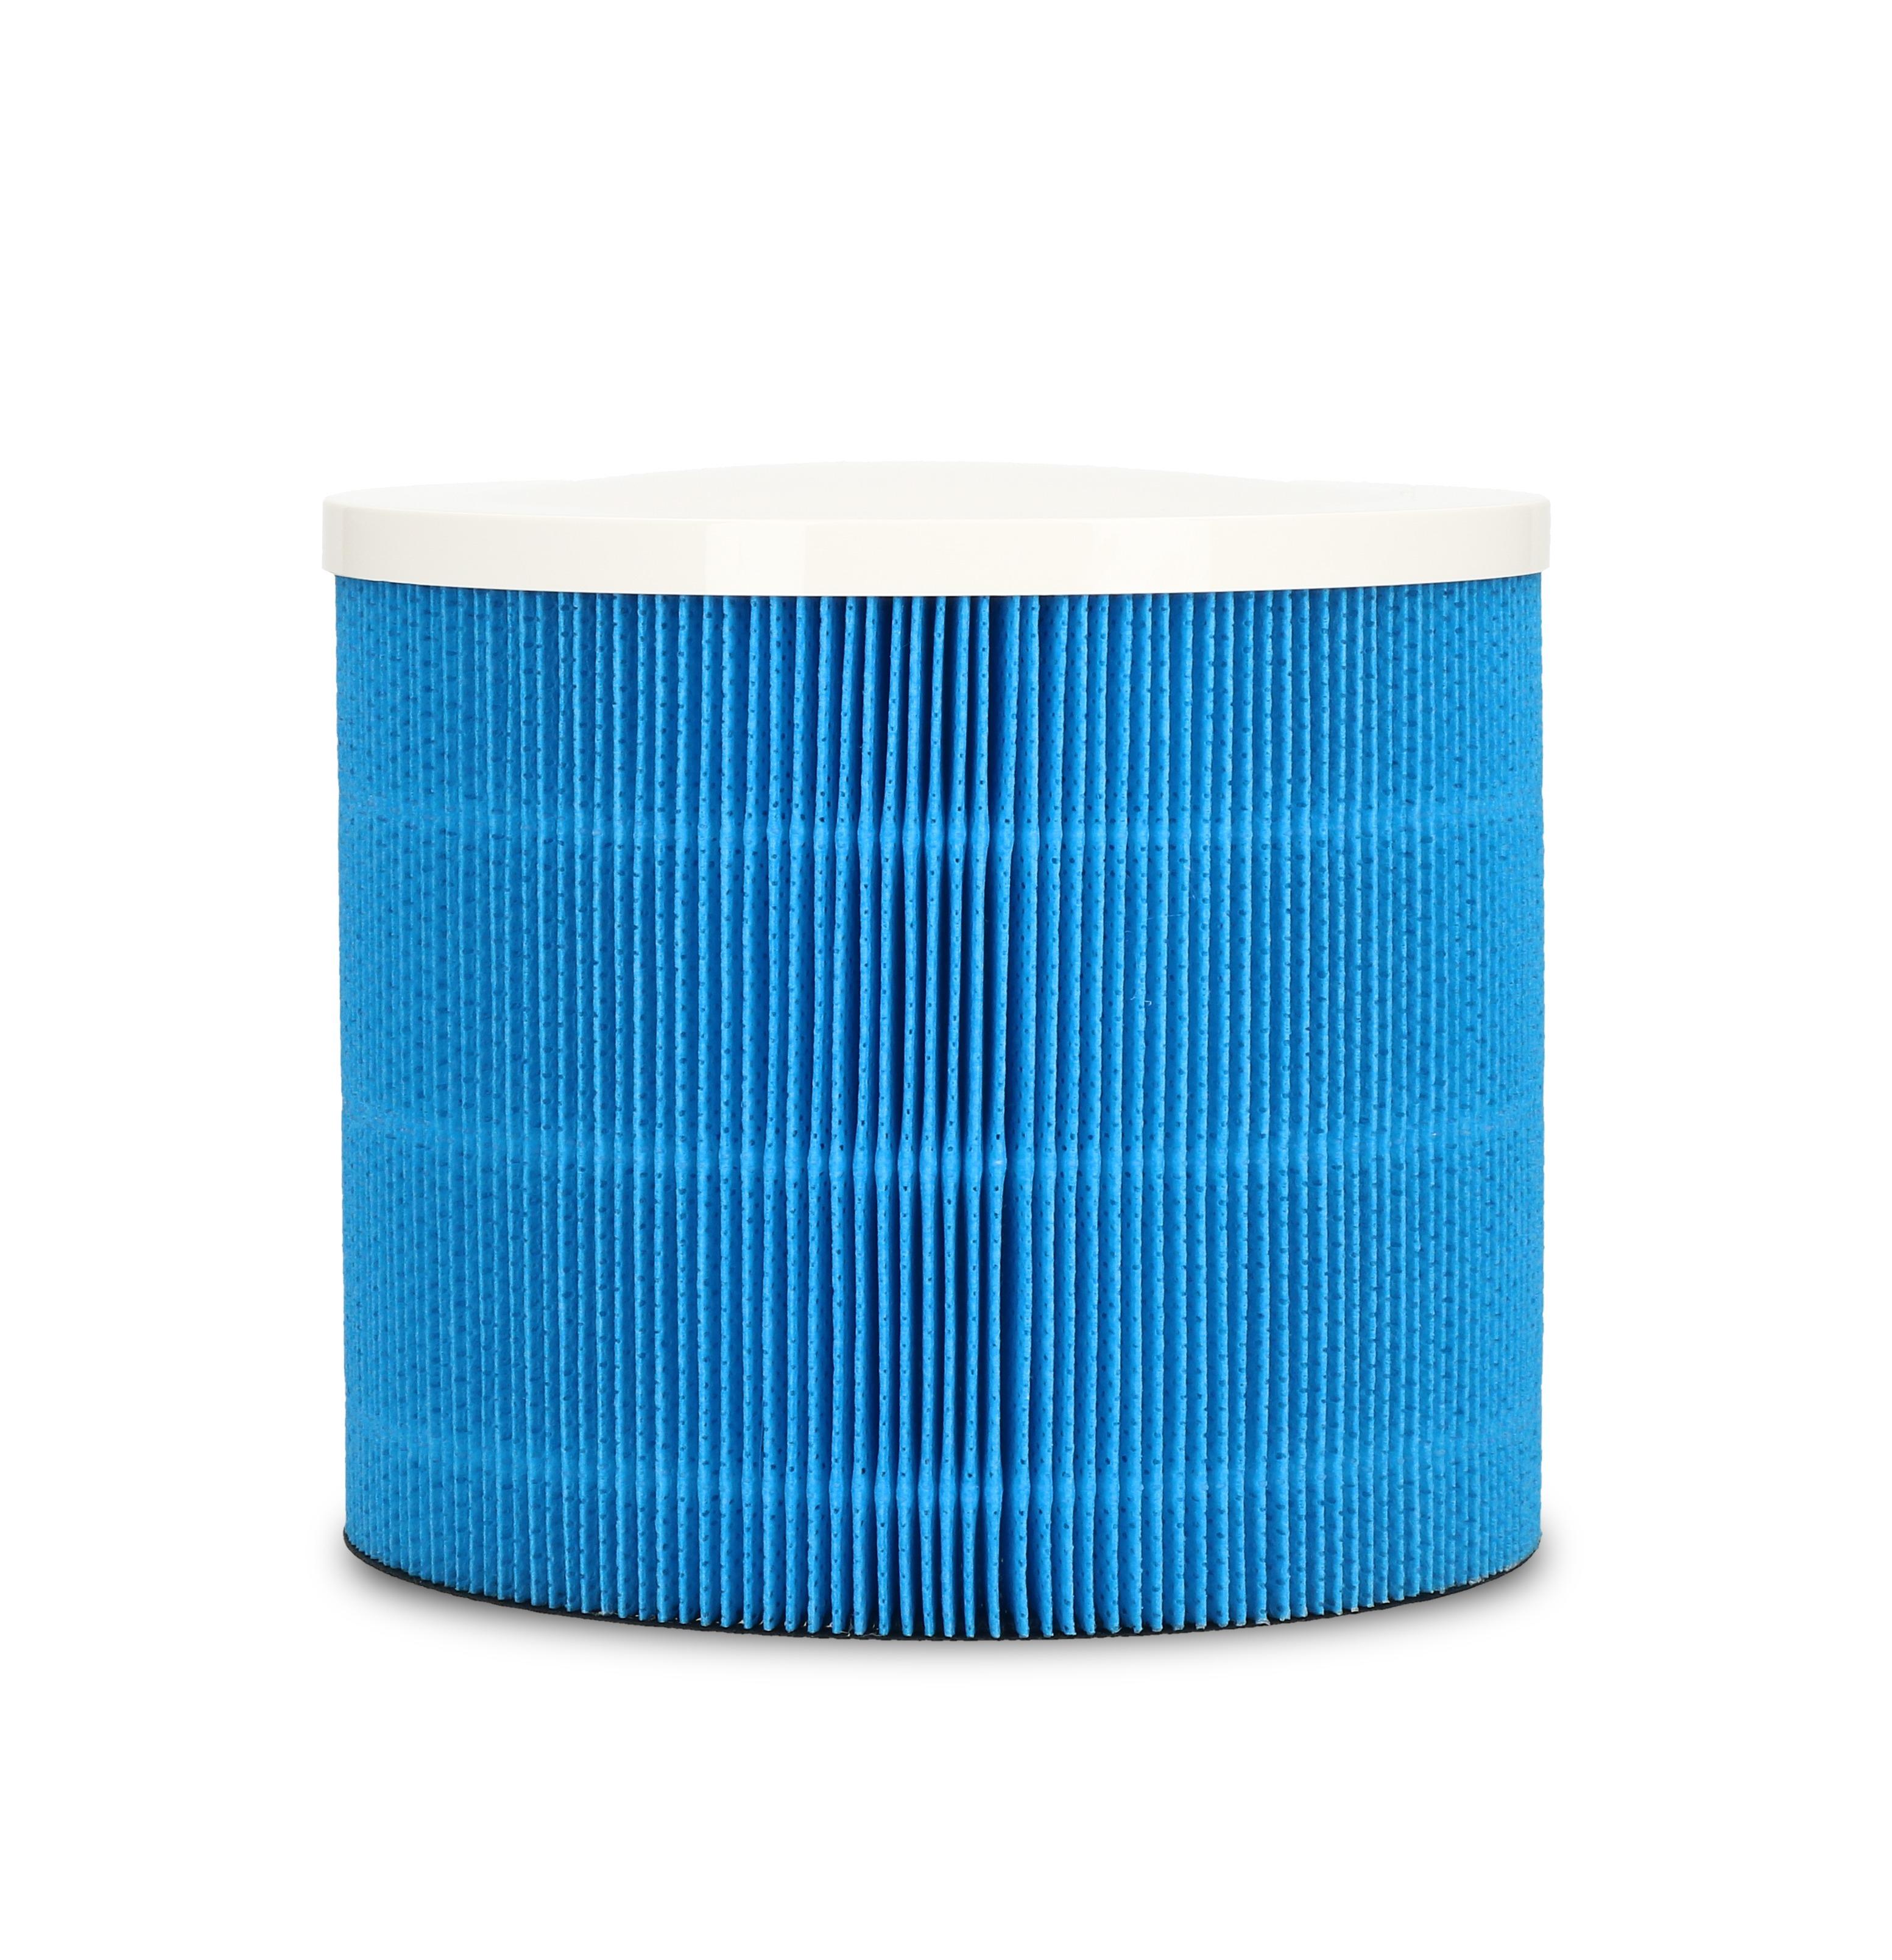 Duux klimaat accessoire PET Nylon Filter for Ovi Humidifier